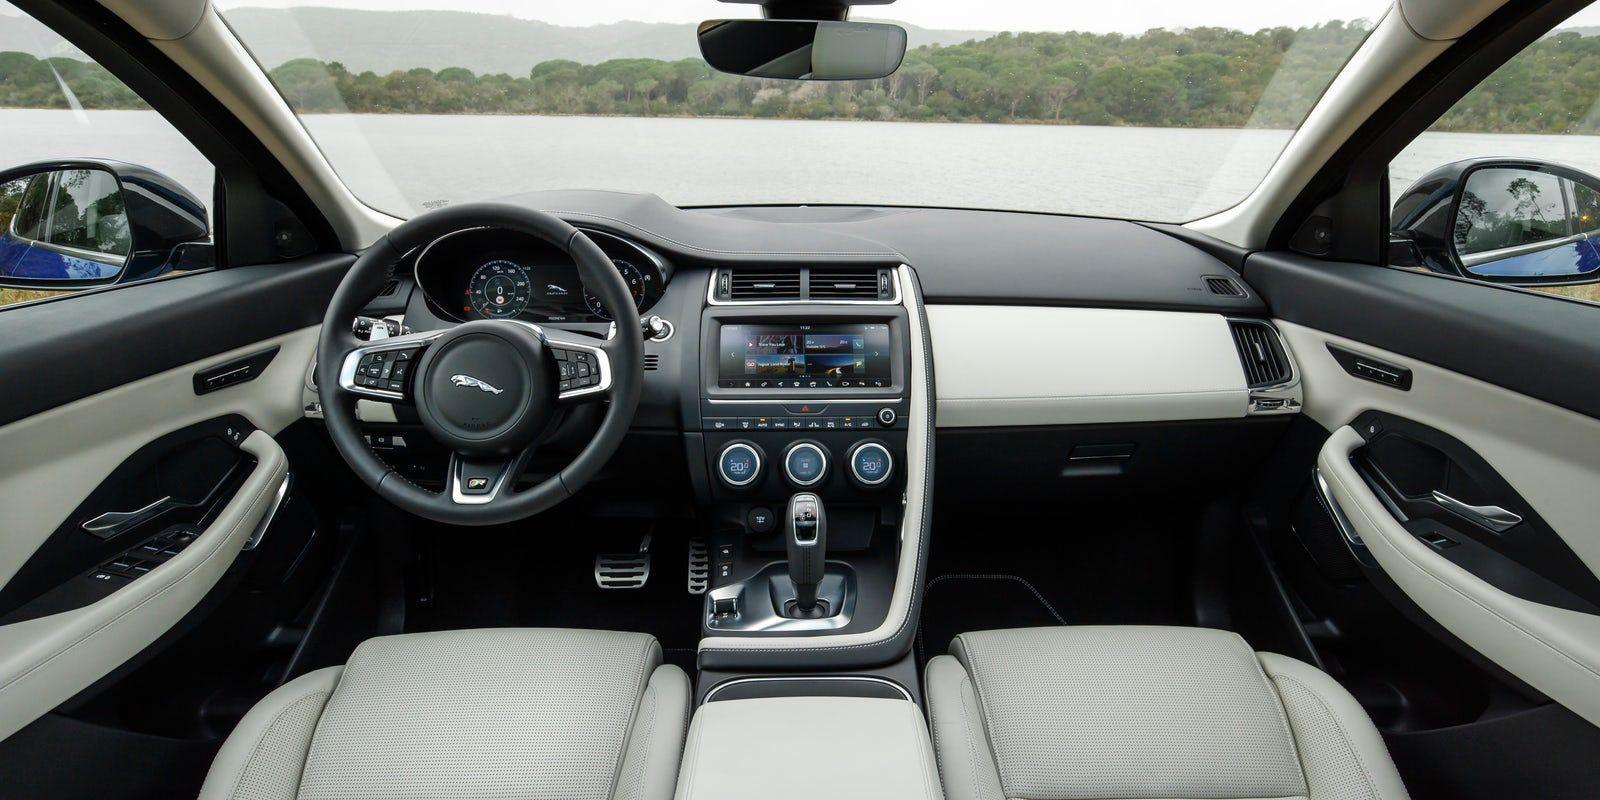 Kết quả hình ảnh cho Jaguar E-Pace indoor